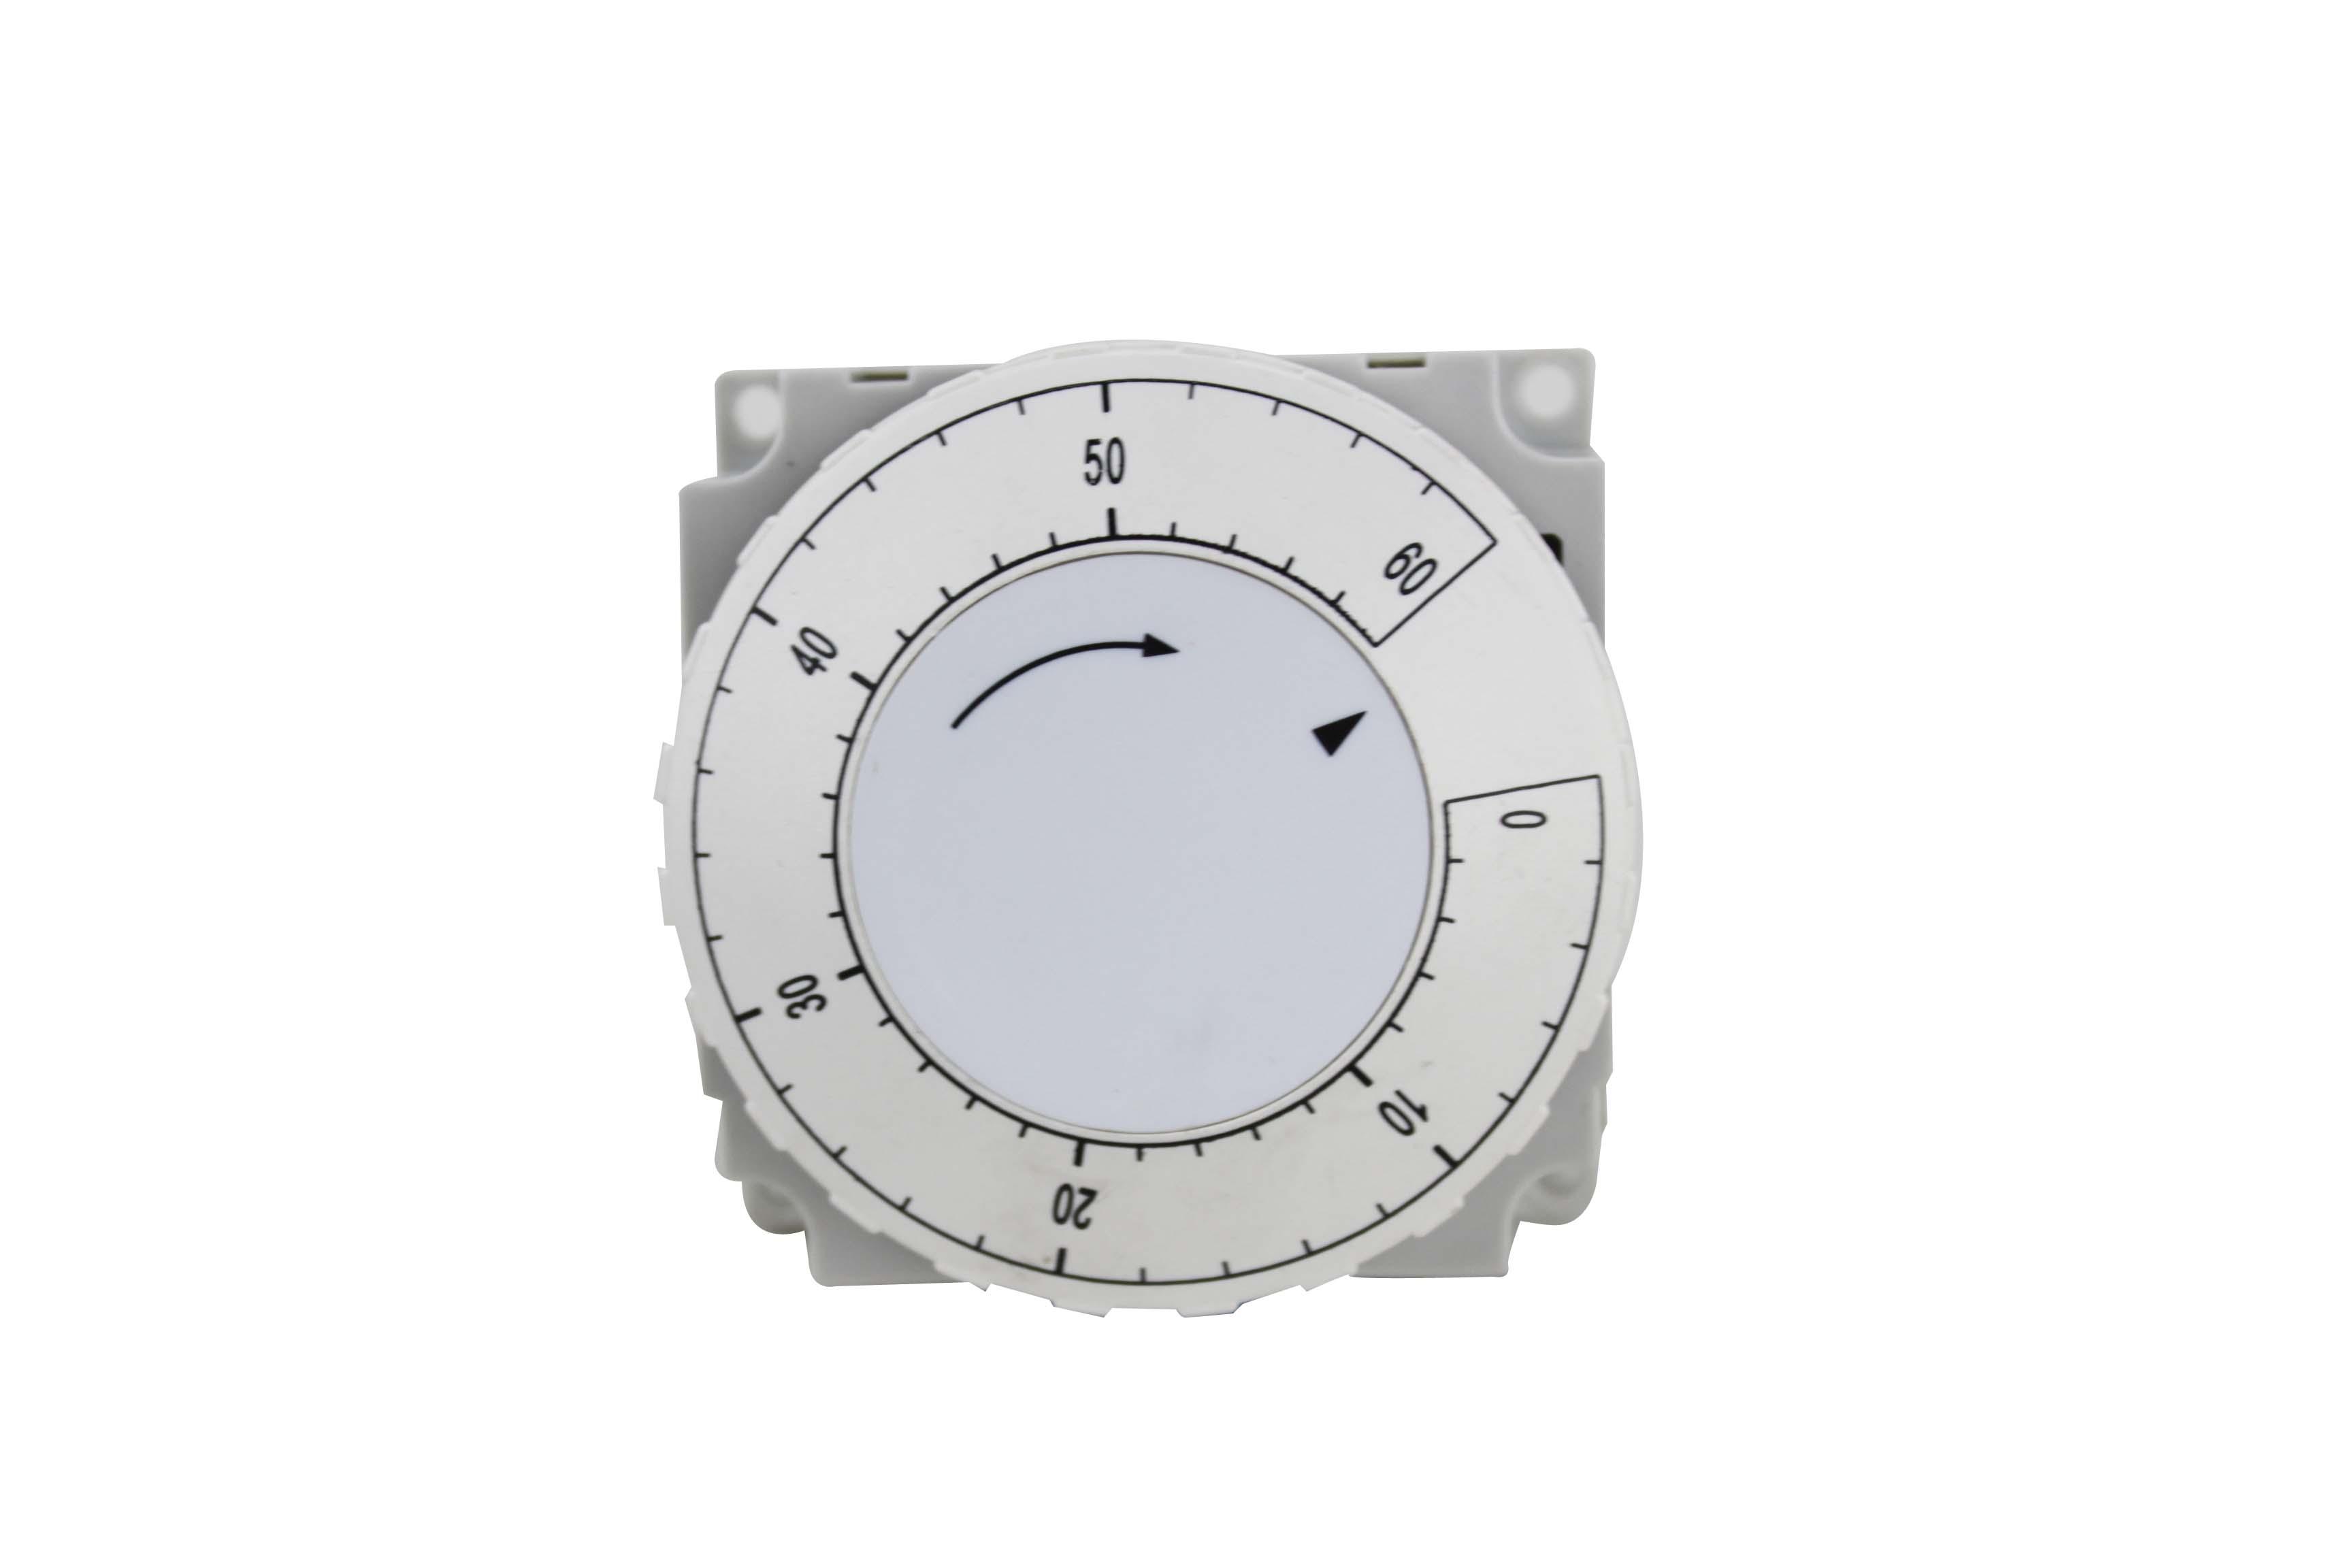 Mechanical countdown timer